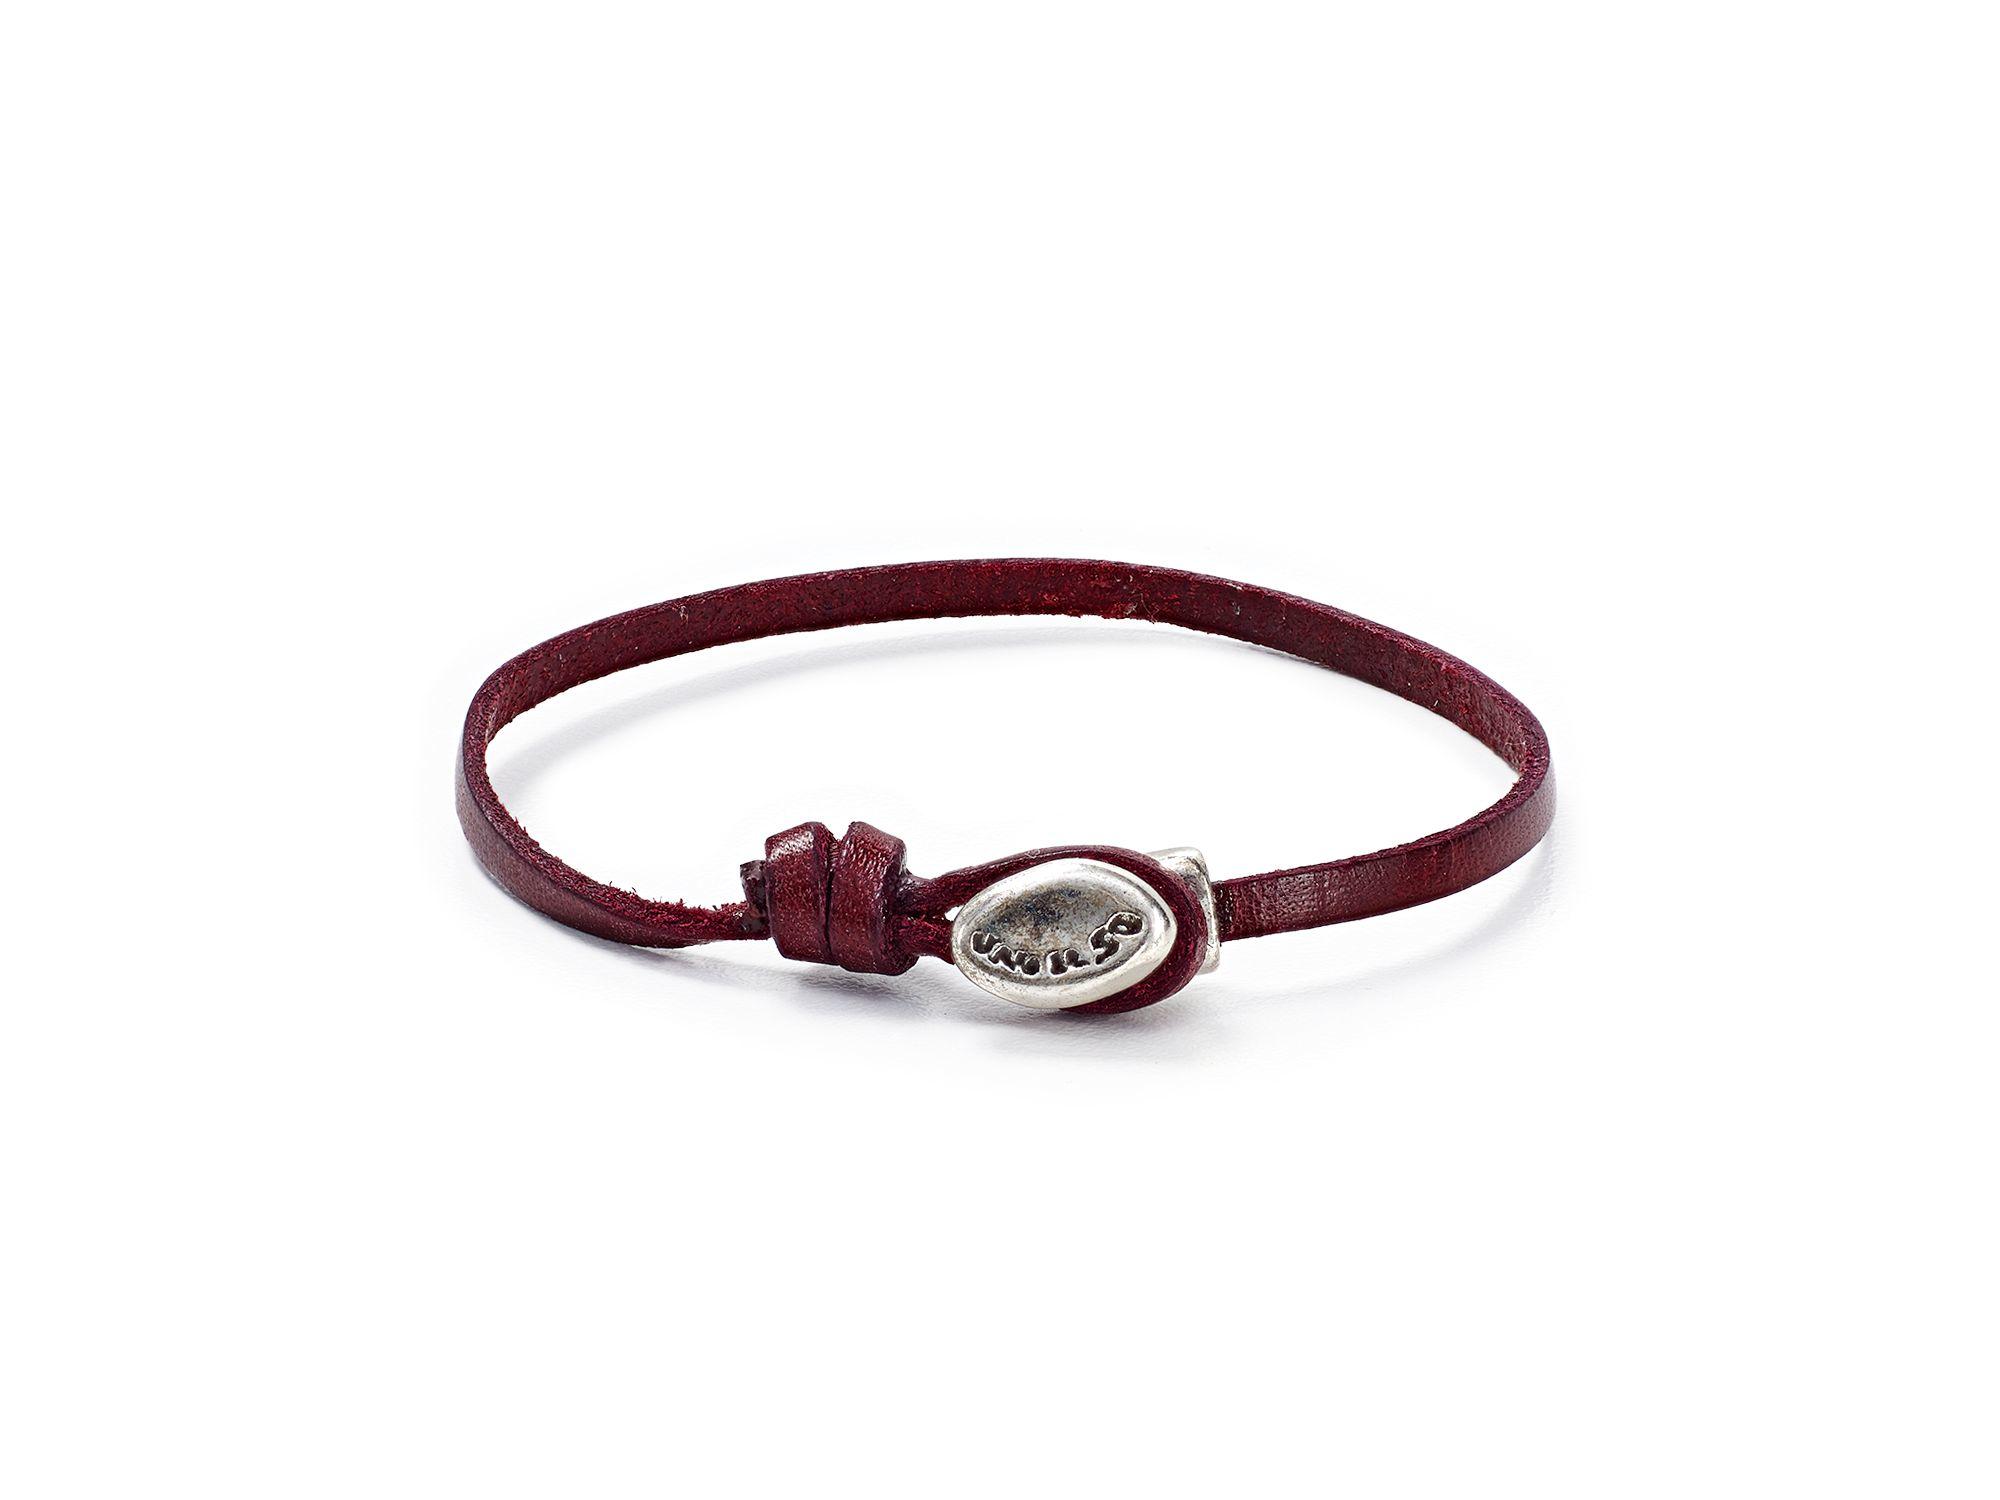 22c1565454615 Lyst - Uno De 50 Tied Up Leather Bracelet in Brown